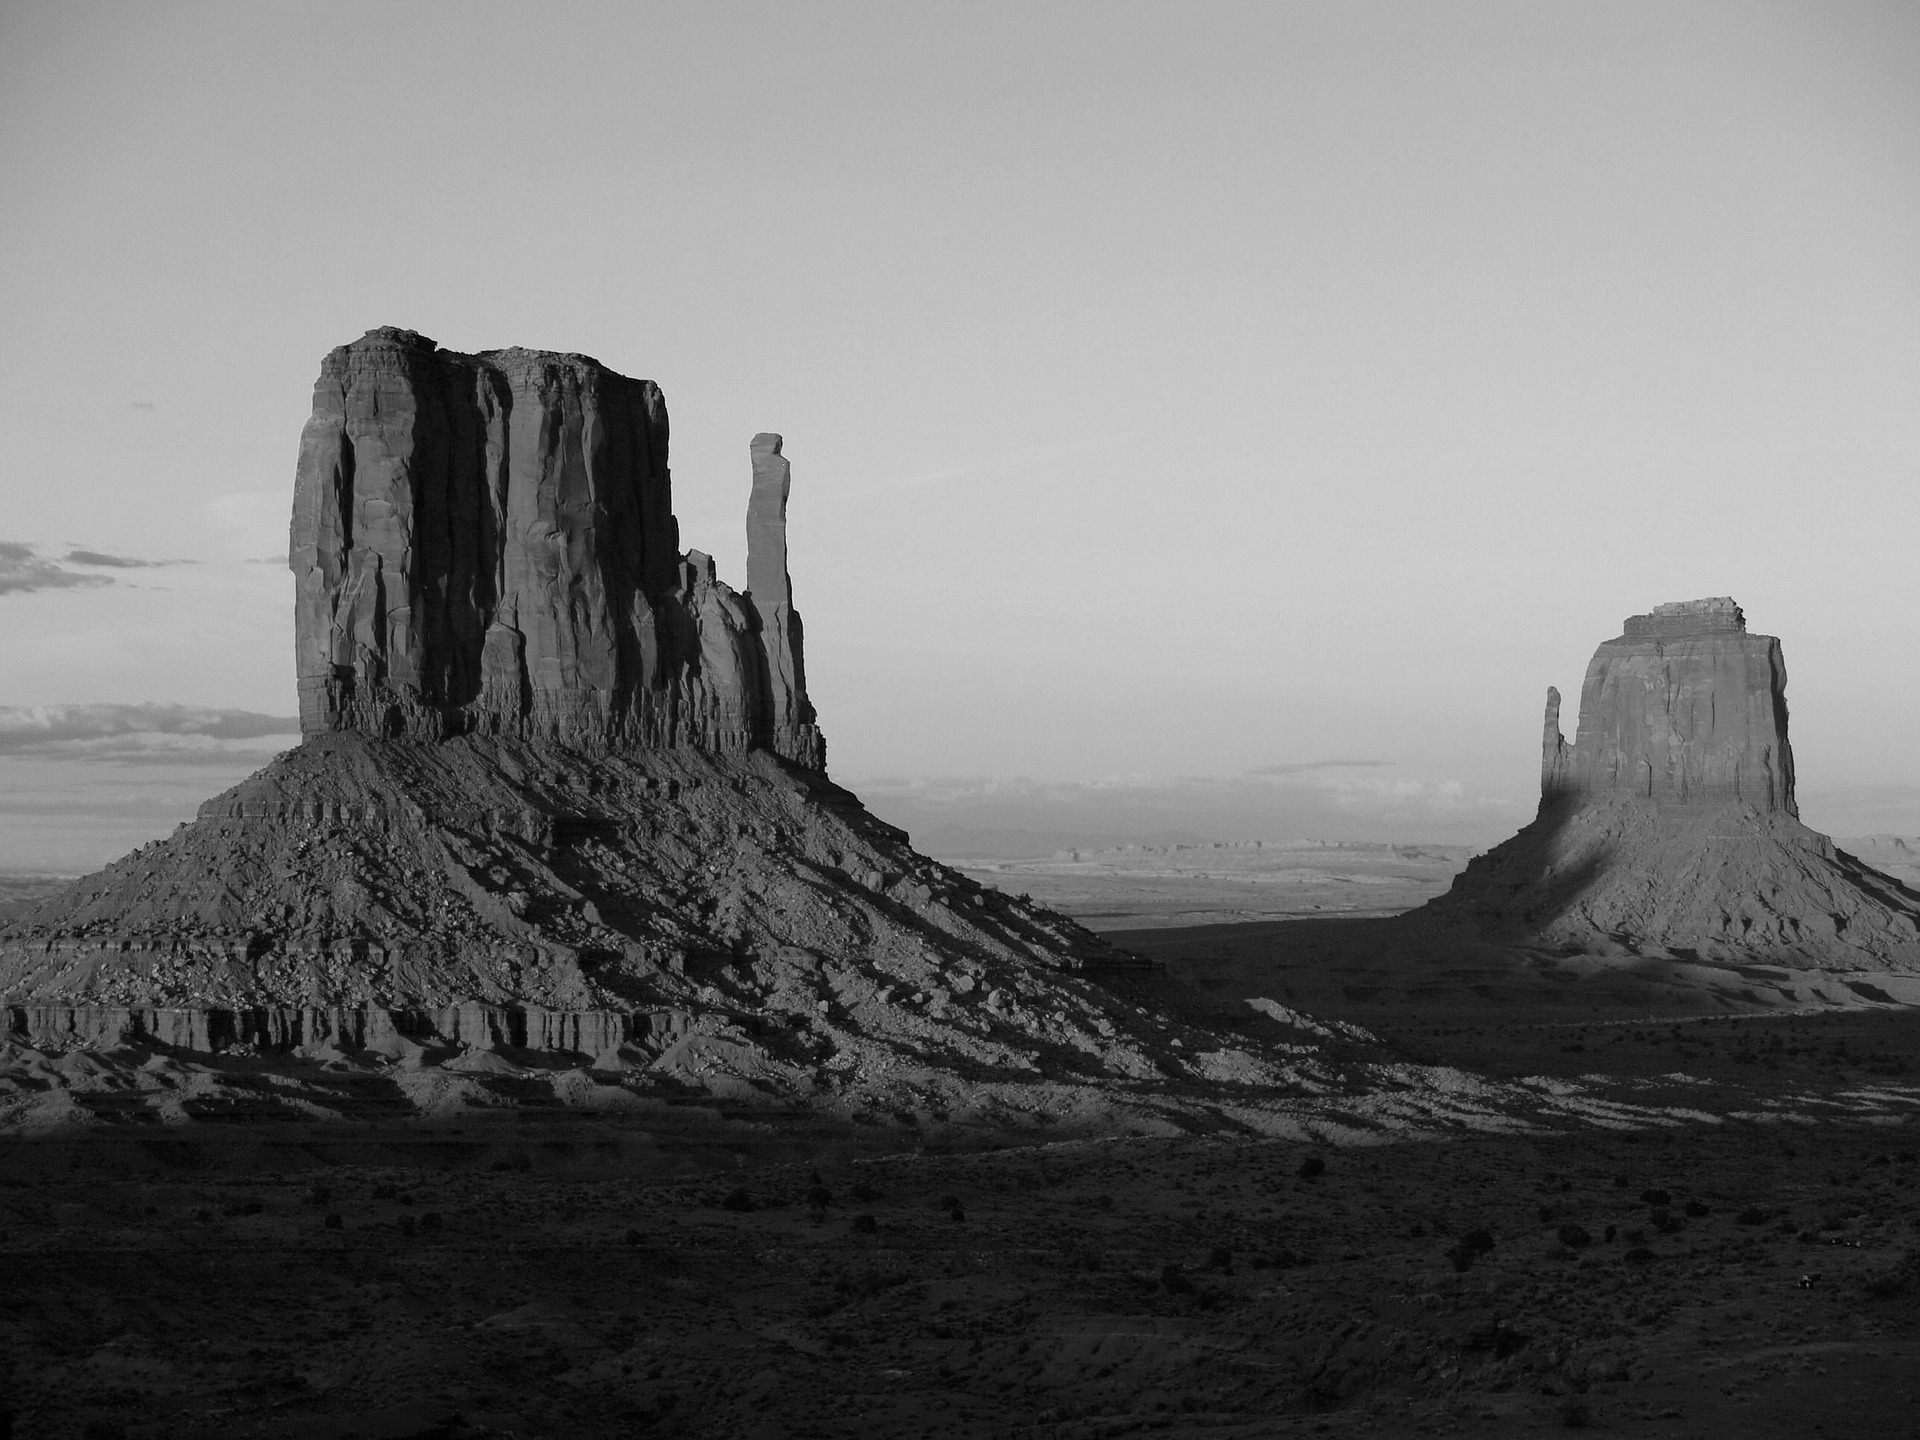 monument-valley-53637_1920_edited.jpeg